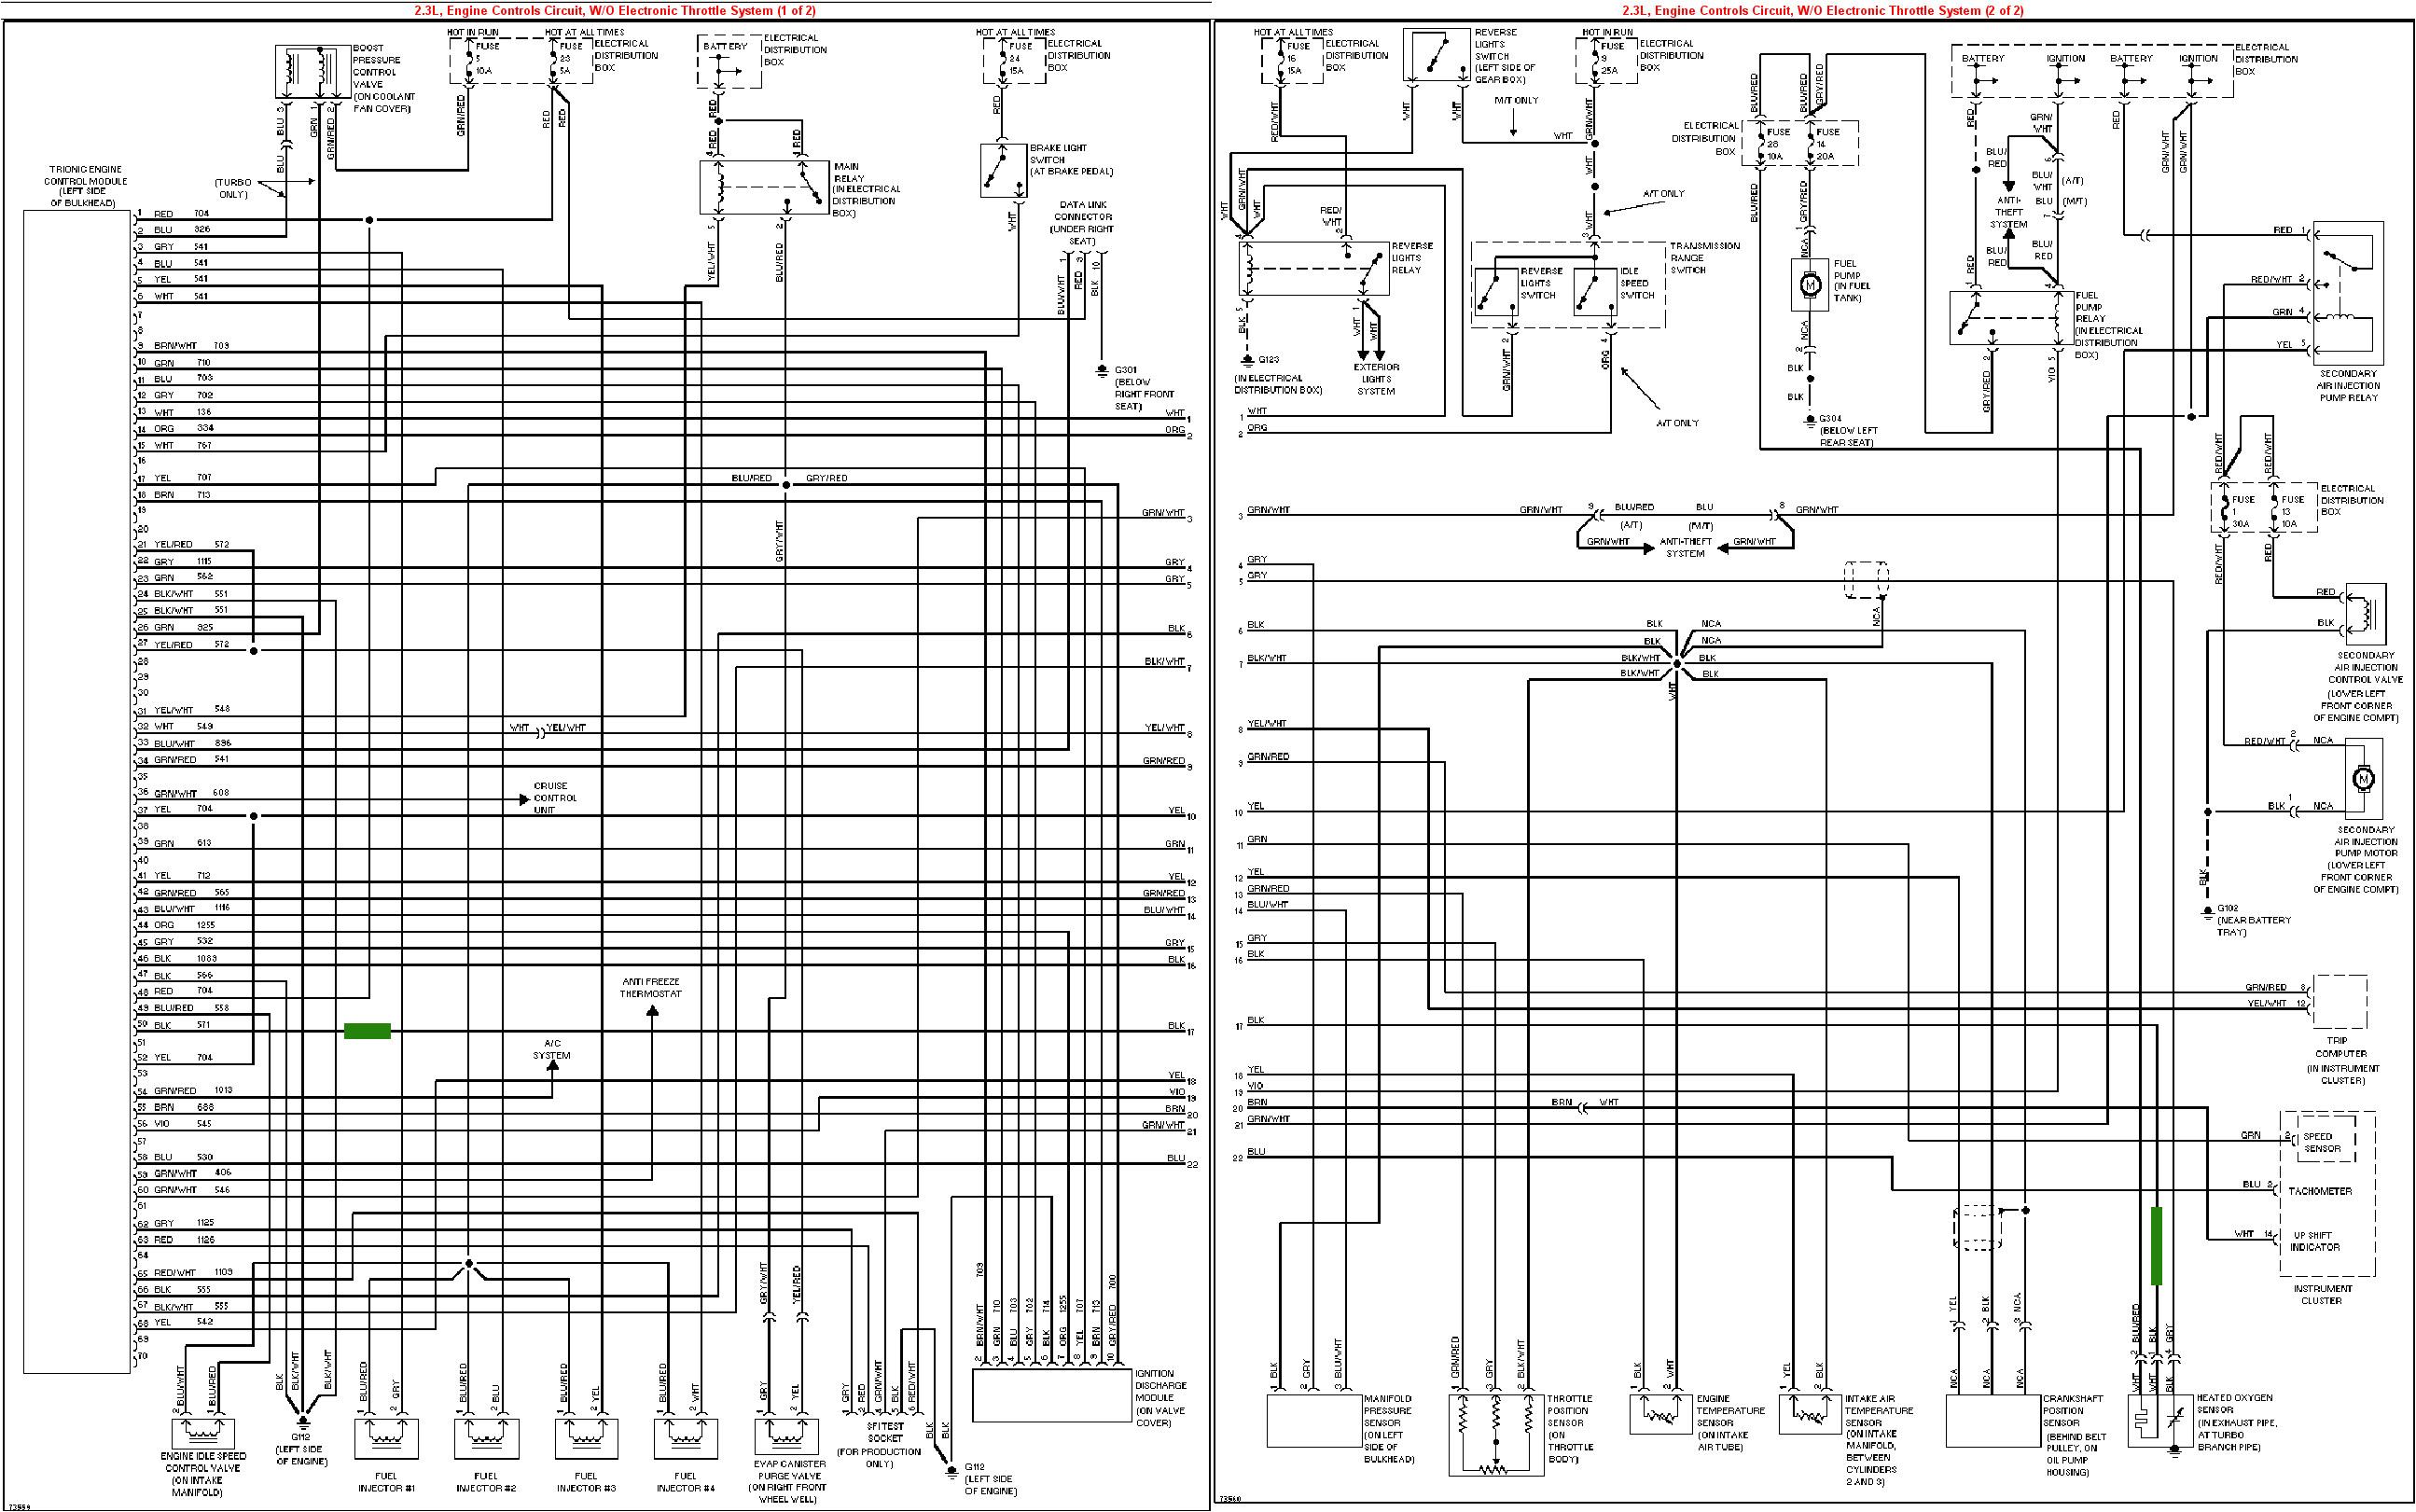 saab 93 1 9 tid wiring diagram wiring diagram datasource 1999 saab 9 3 wiring diagram